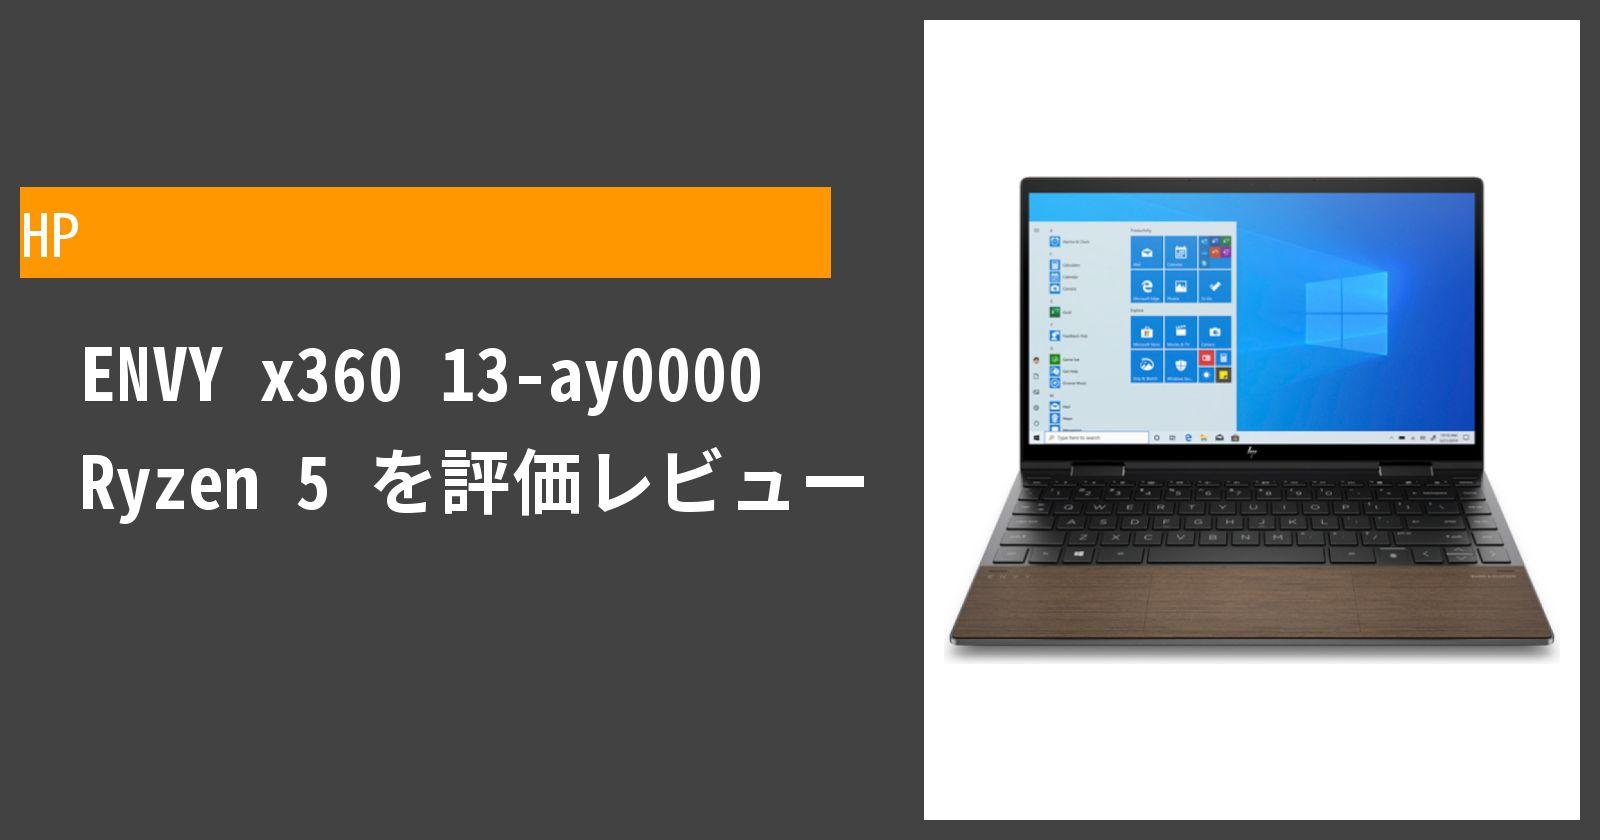 ENVY x360 13-ay0000 Ryzen 5を徹底評価